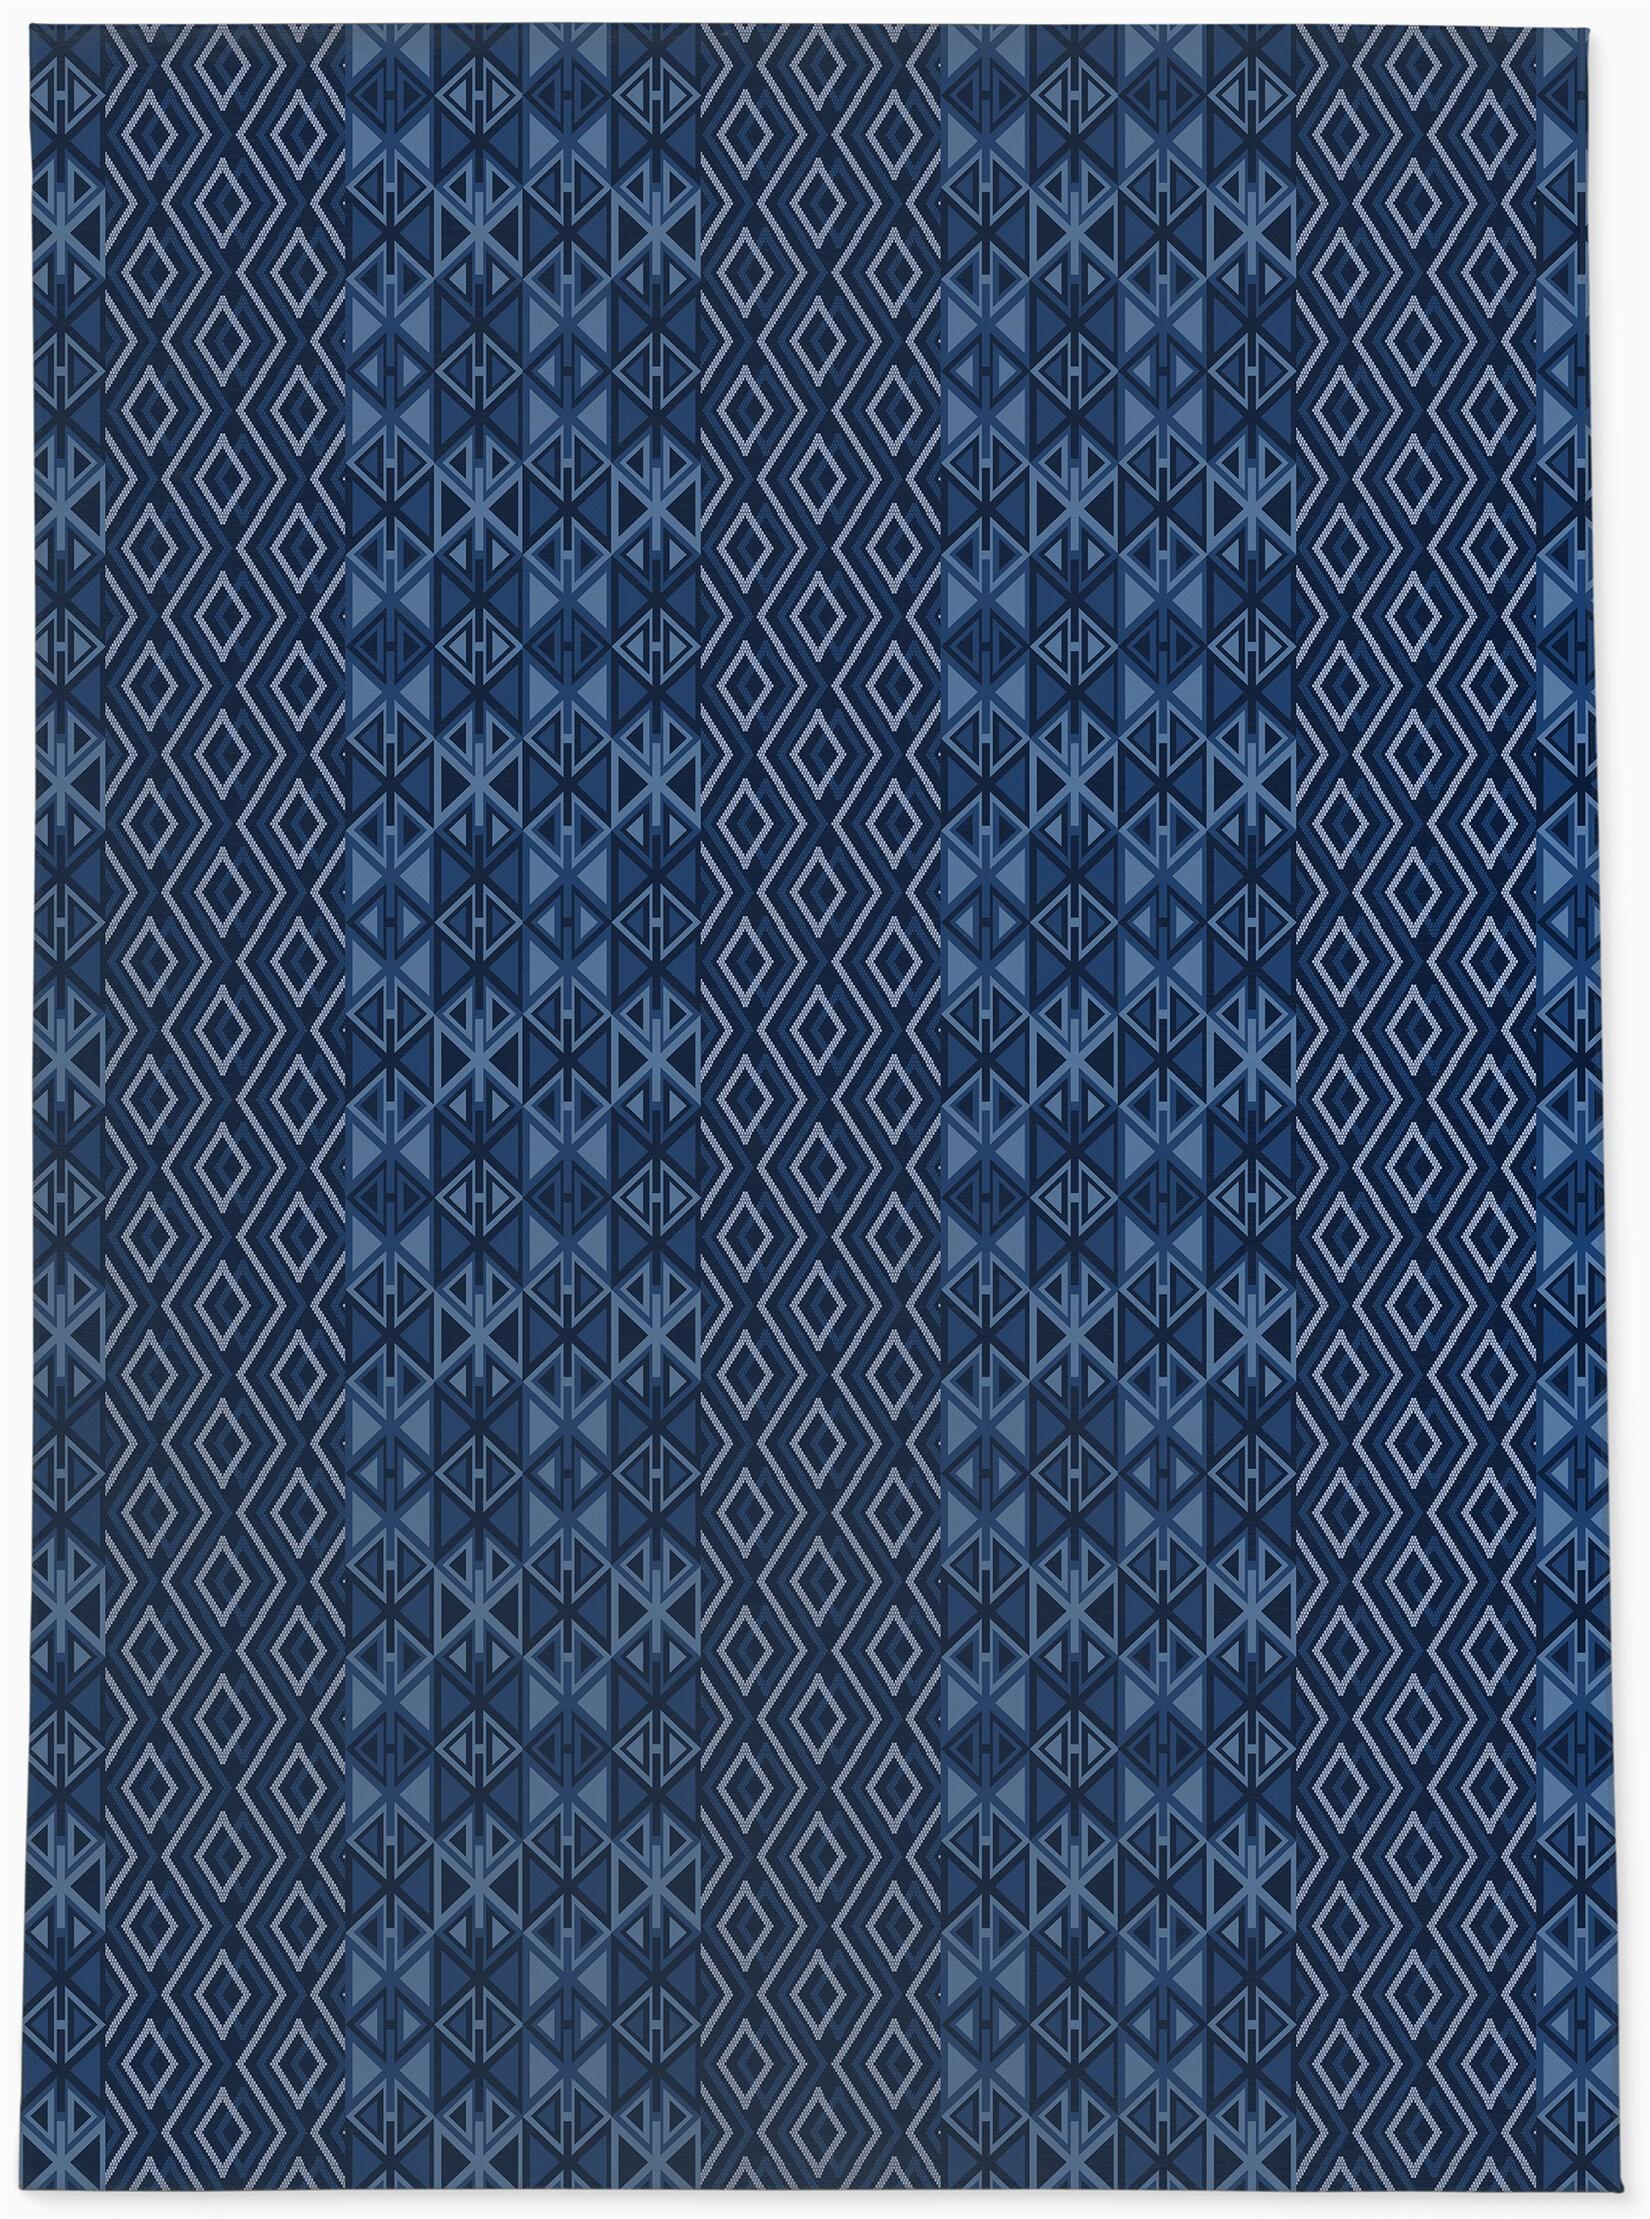 louisiana geometric navy blue area rug